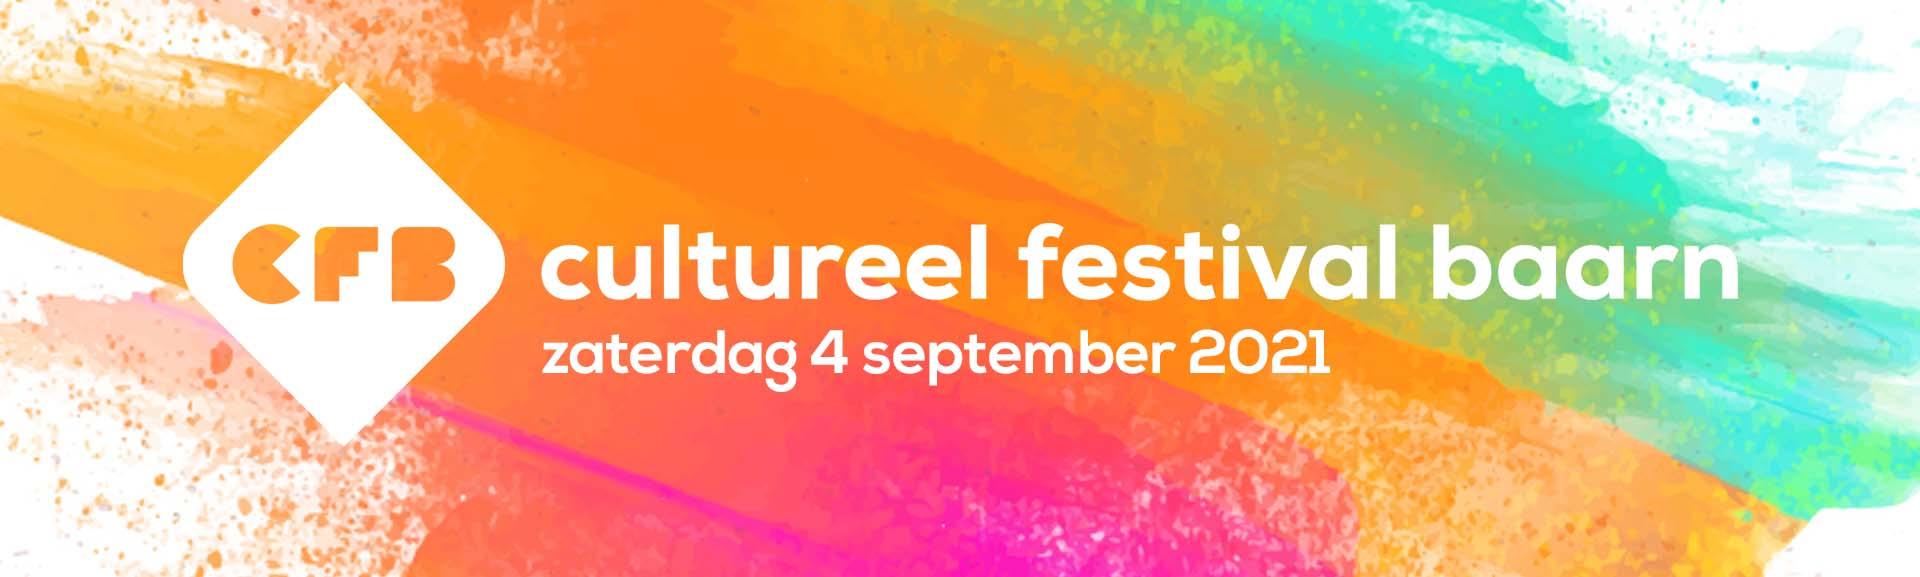 Header-Cultureel-Festival-Baarn-2021